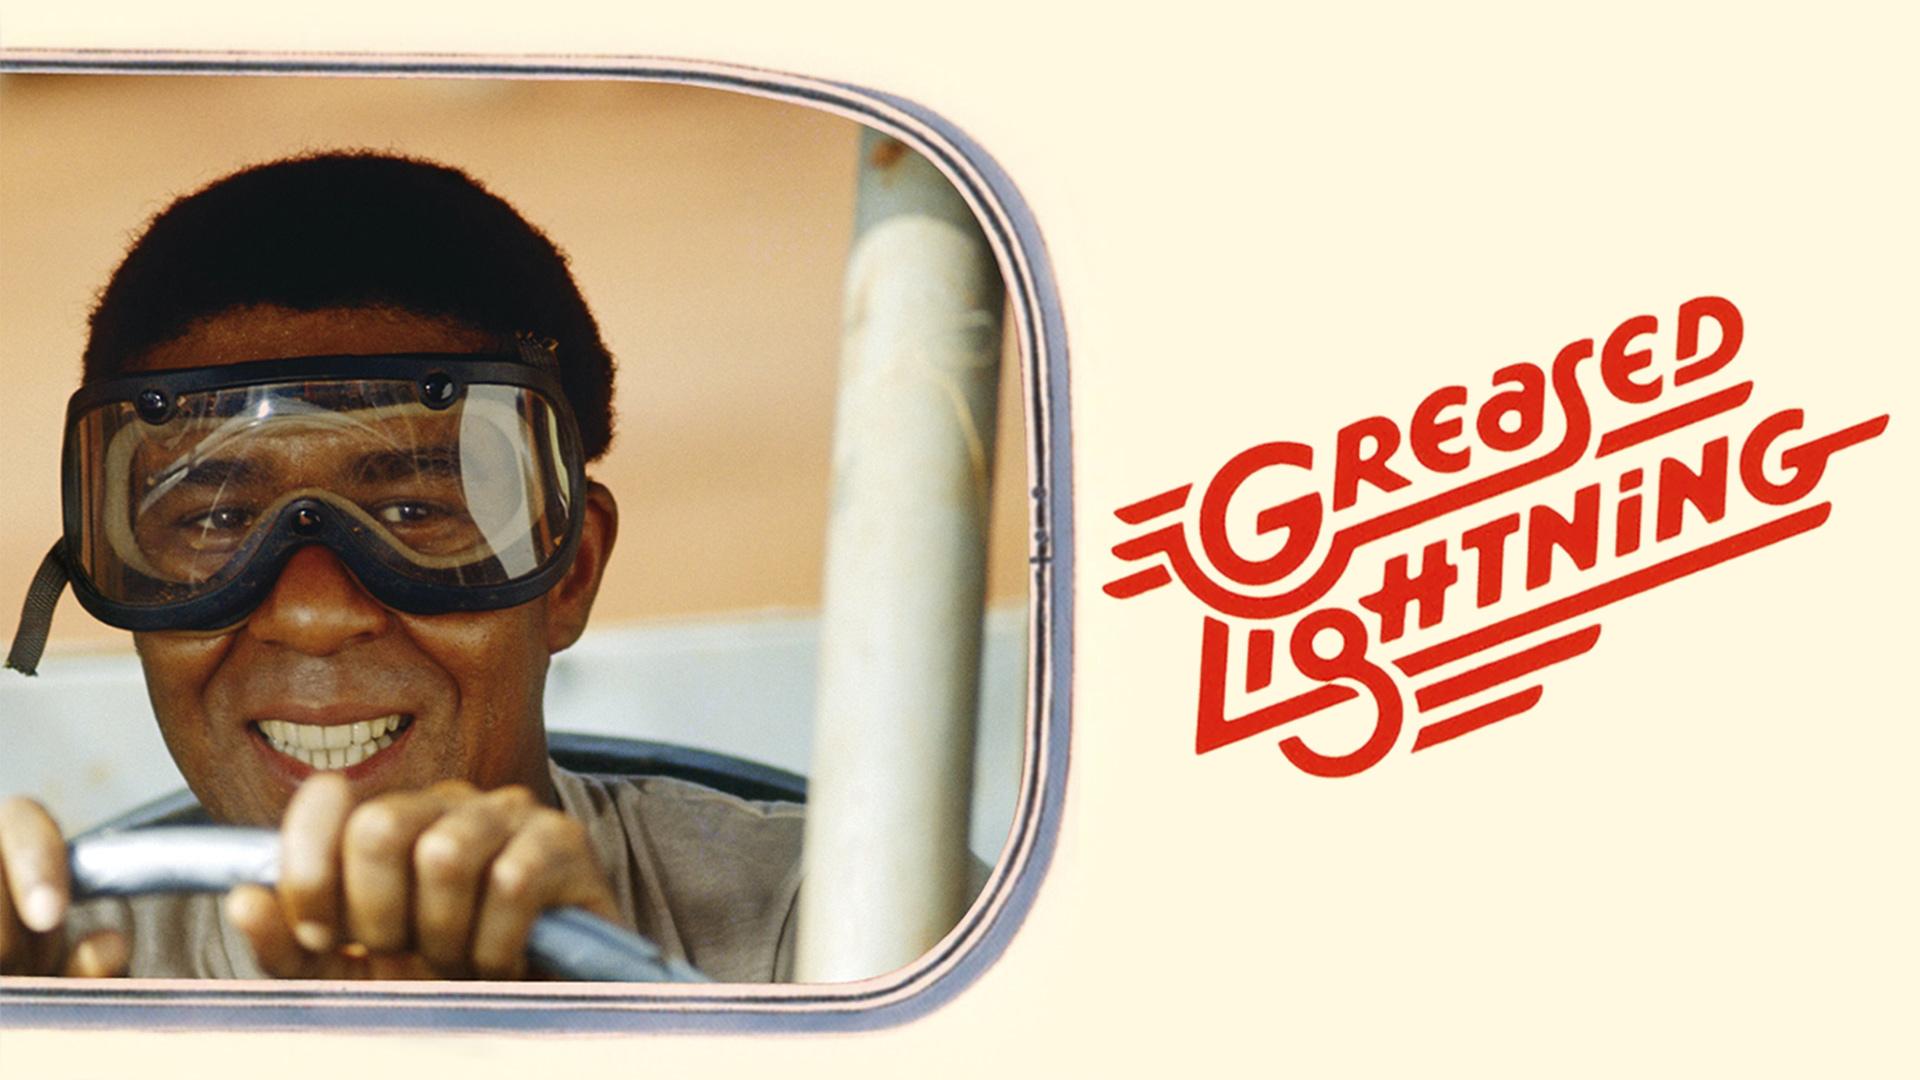 Greased Lightning (1977)